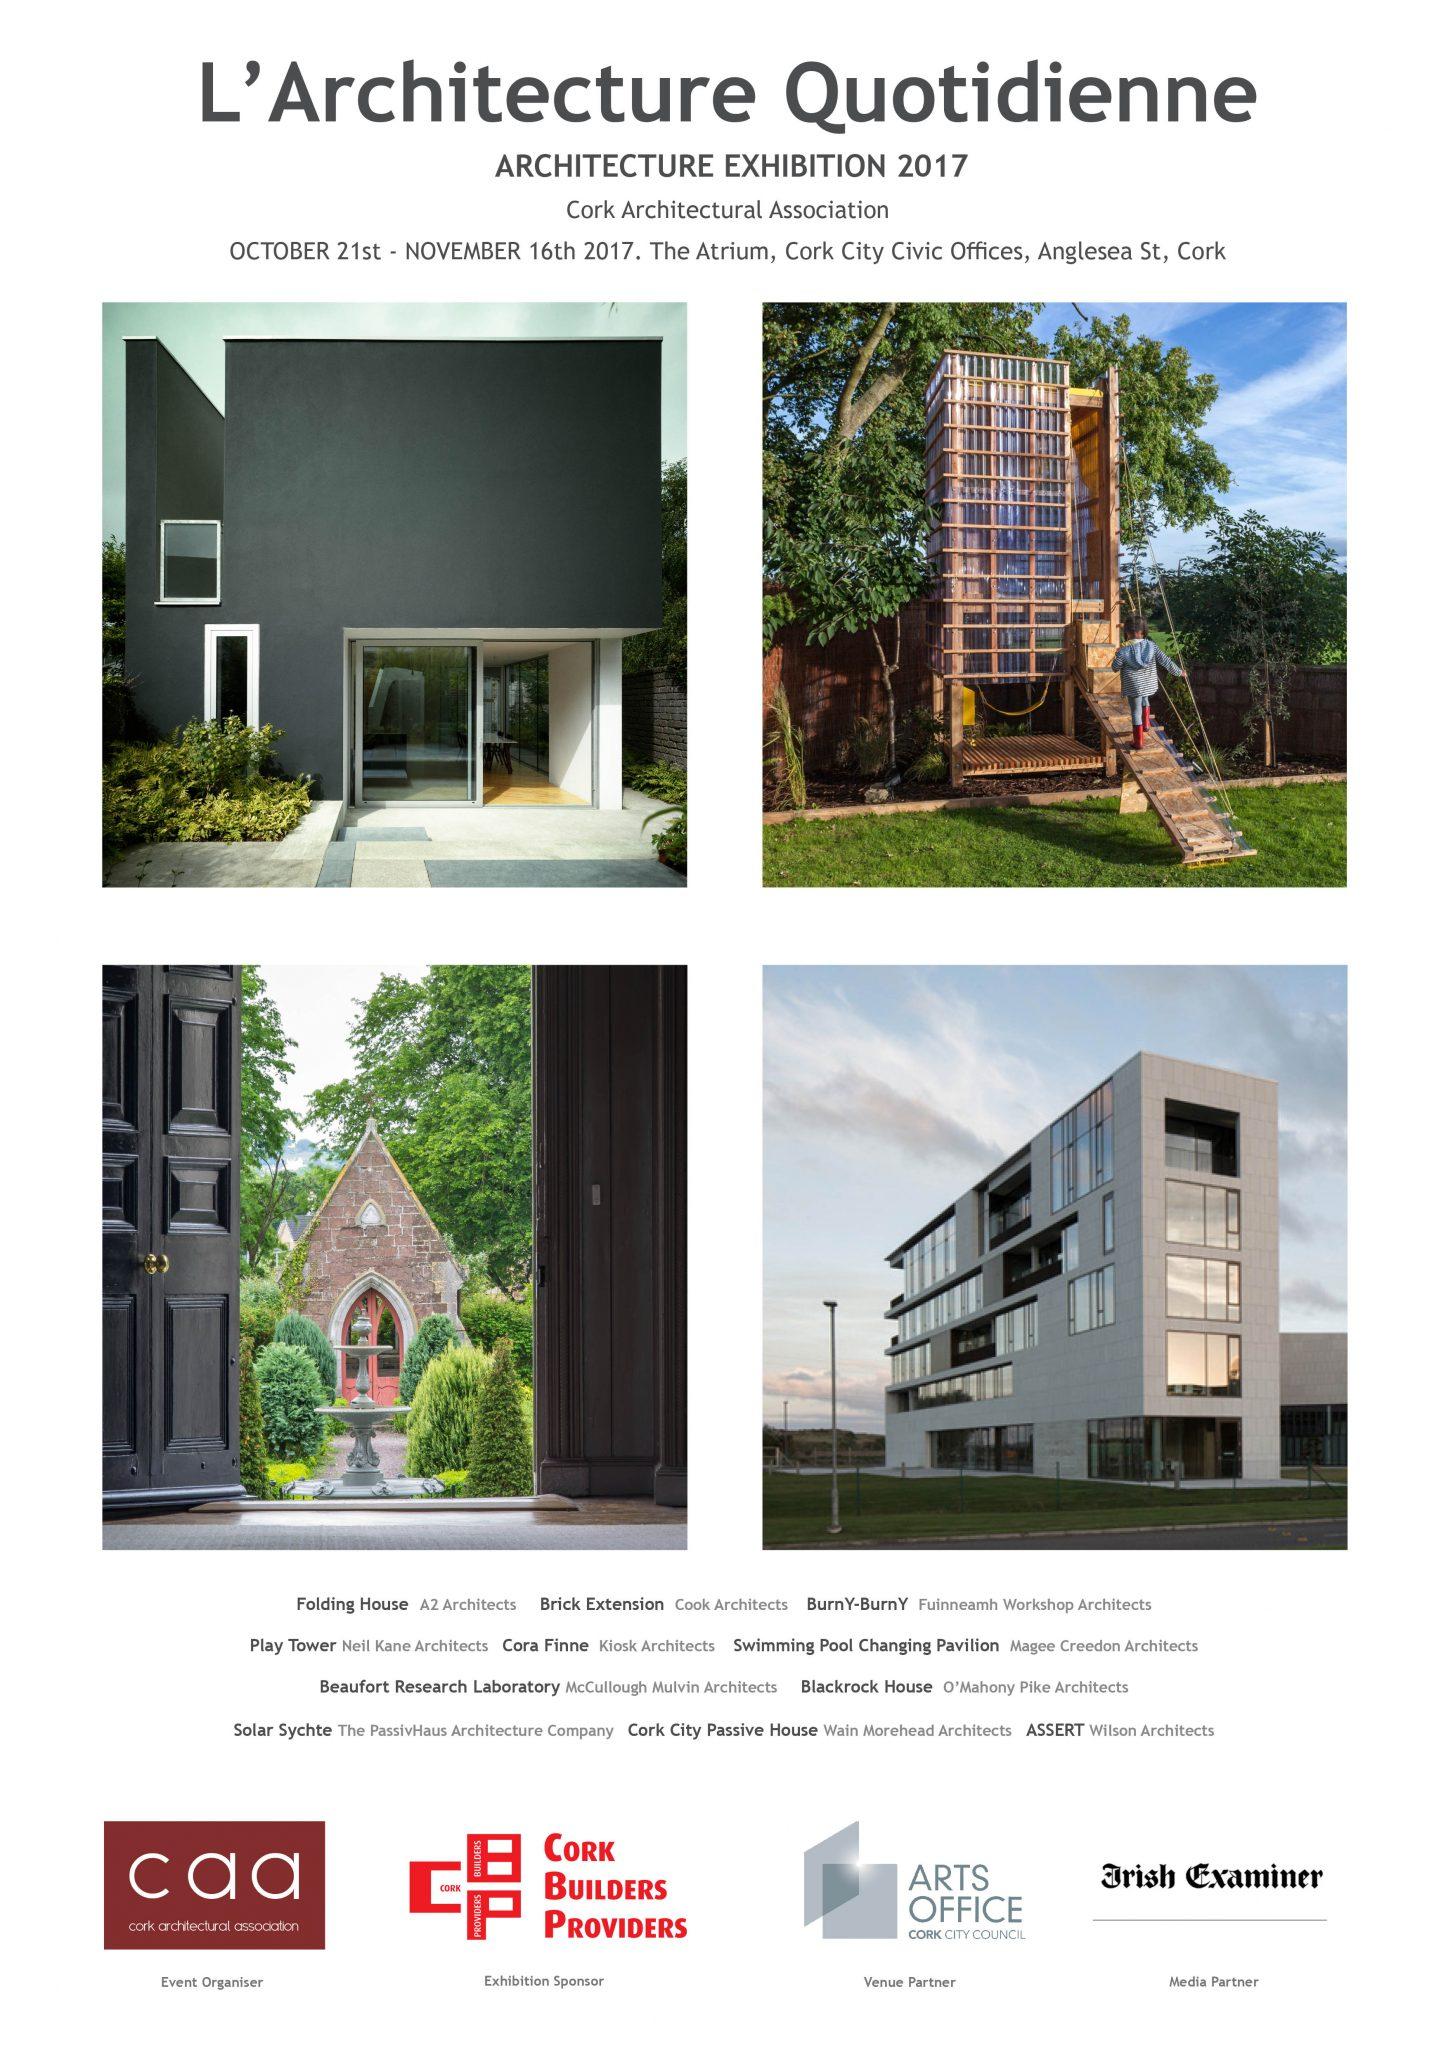 cork architectural association 2017 invitation